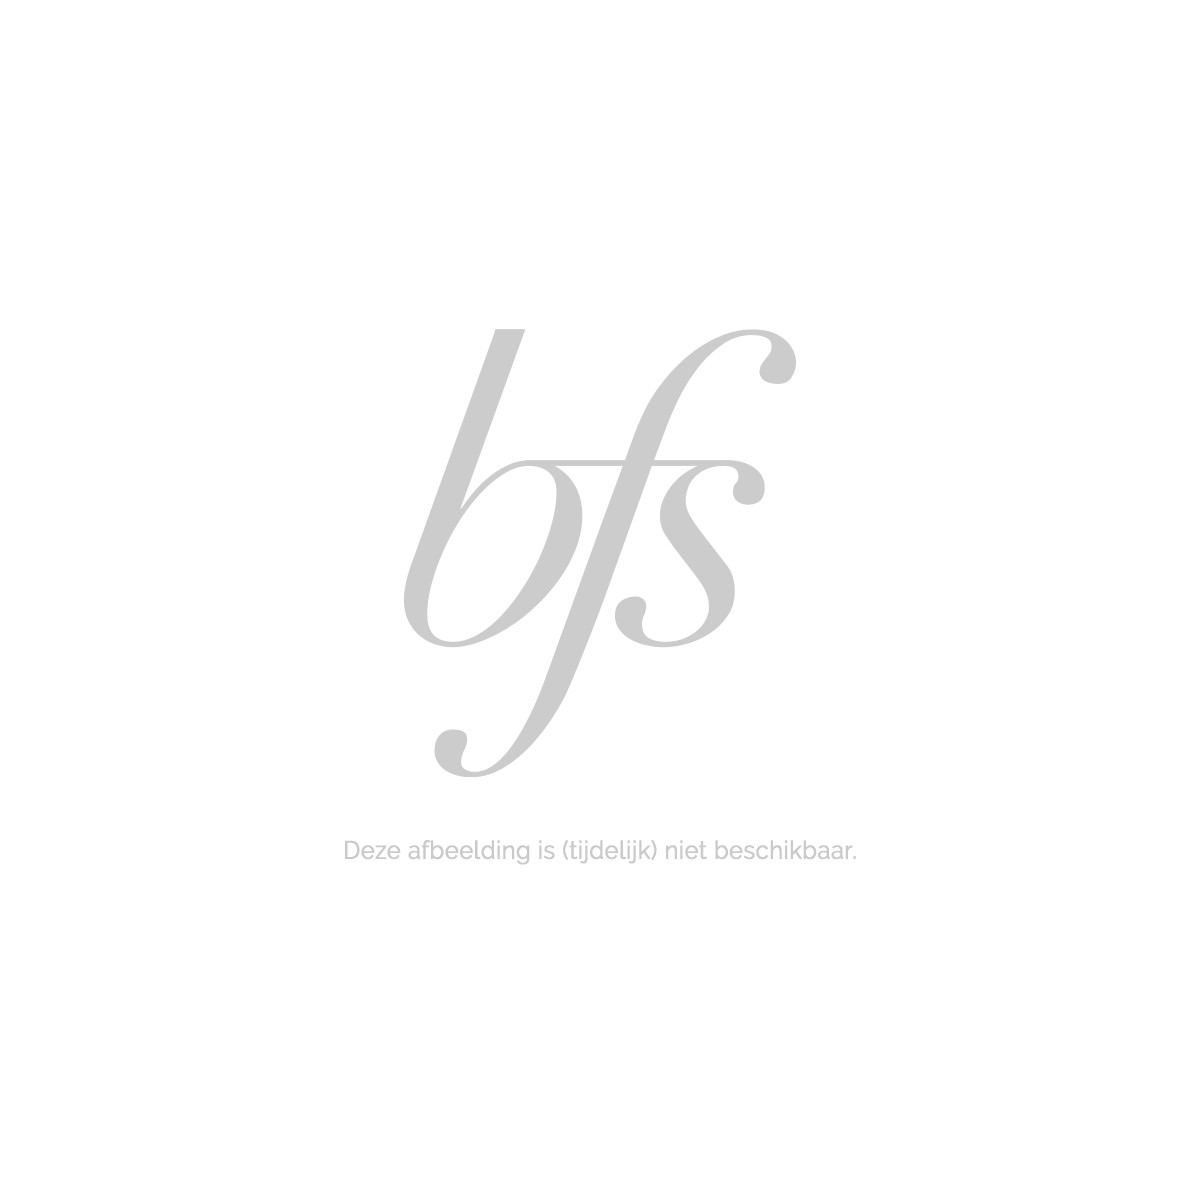 Dr. Tadlea Cosmetica Real Peel Salicylic Exfoliator 2% 50 Ml